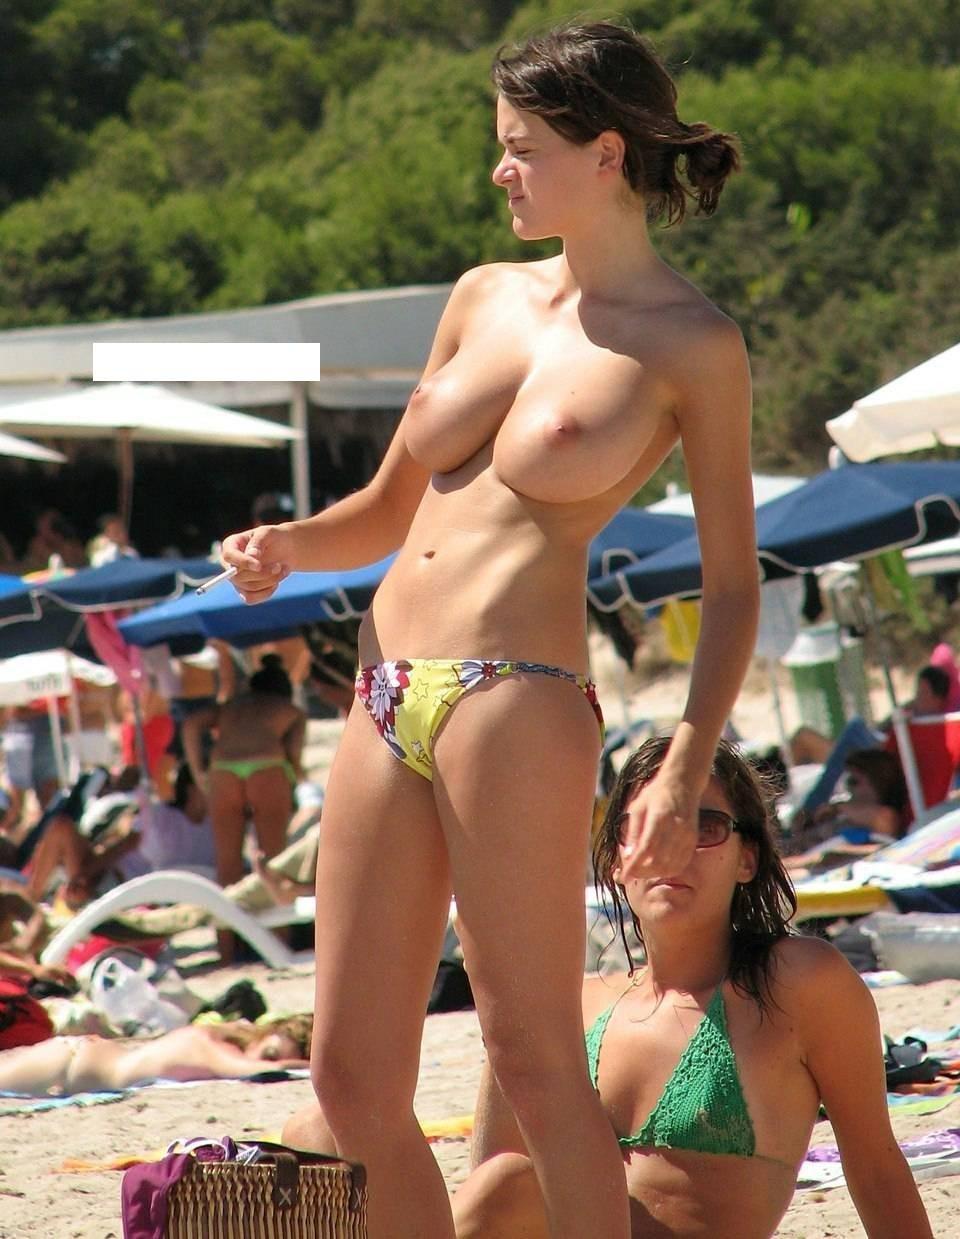 big-titty-voyeur-black-guys-sucking-nipple